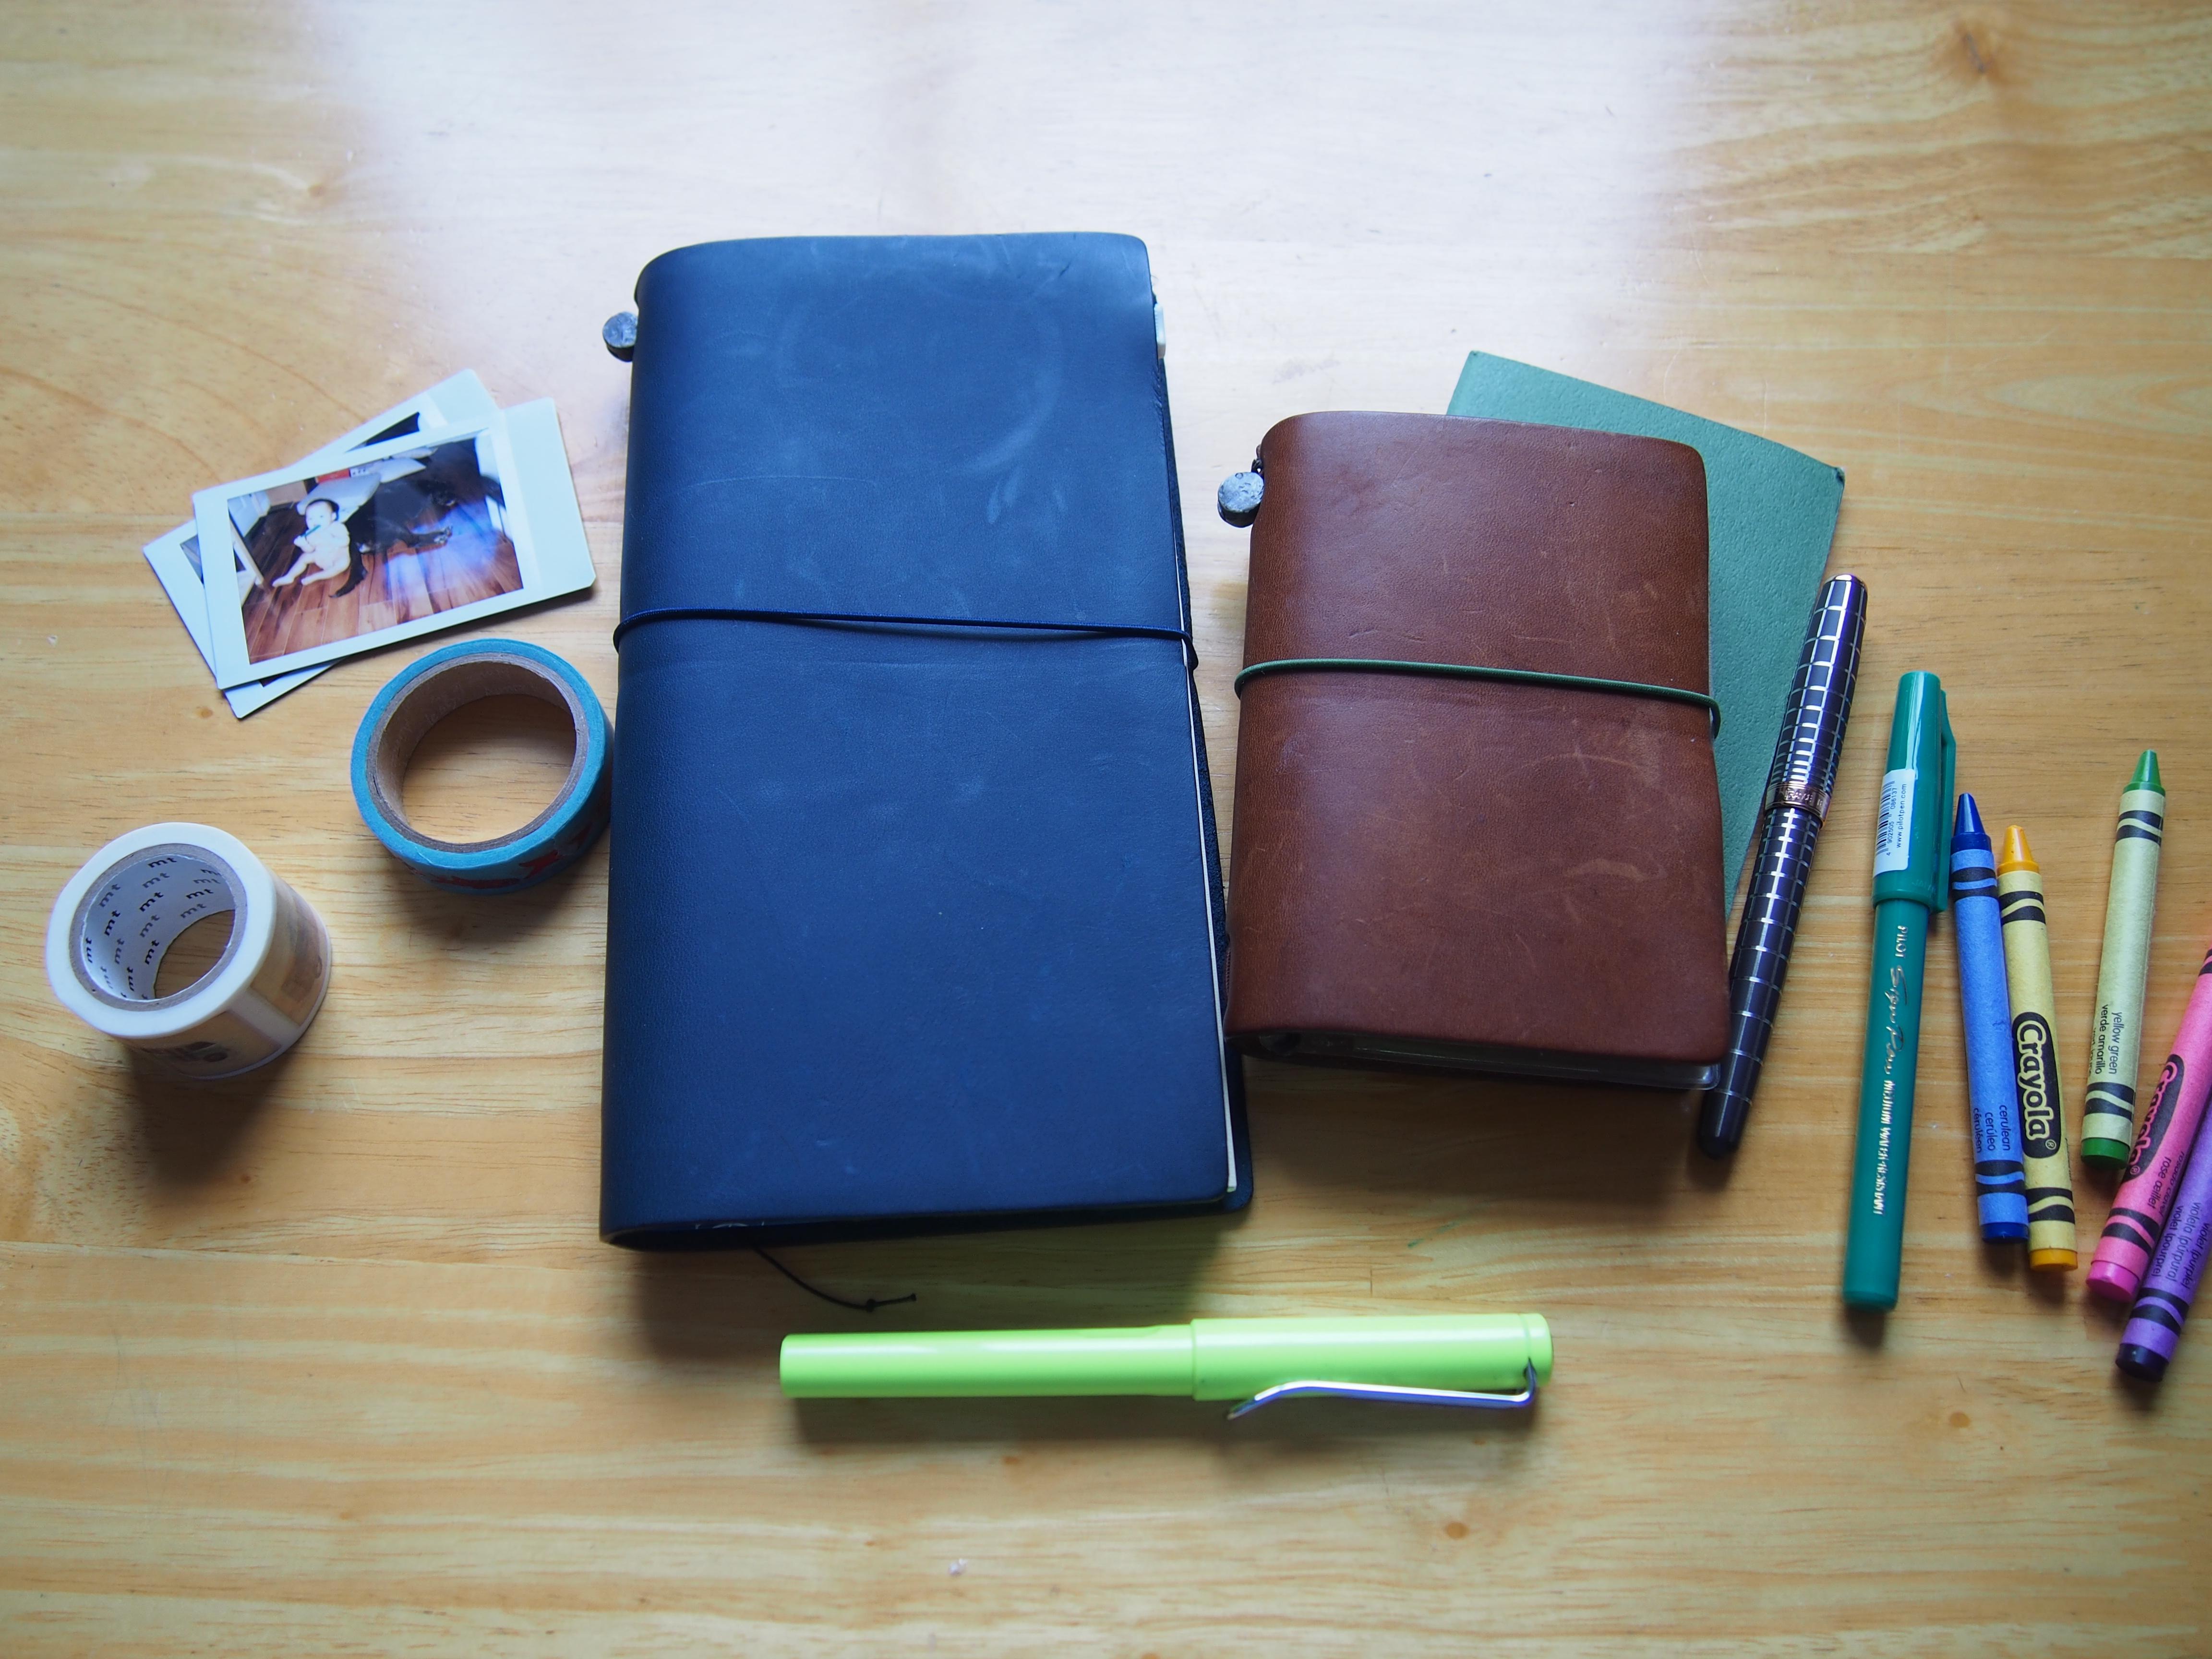 Blue Midori Regular Size Traveler's Notebook Set Up Passport Wonder Pens Blog wonderpens.ca Toronto Canada